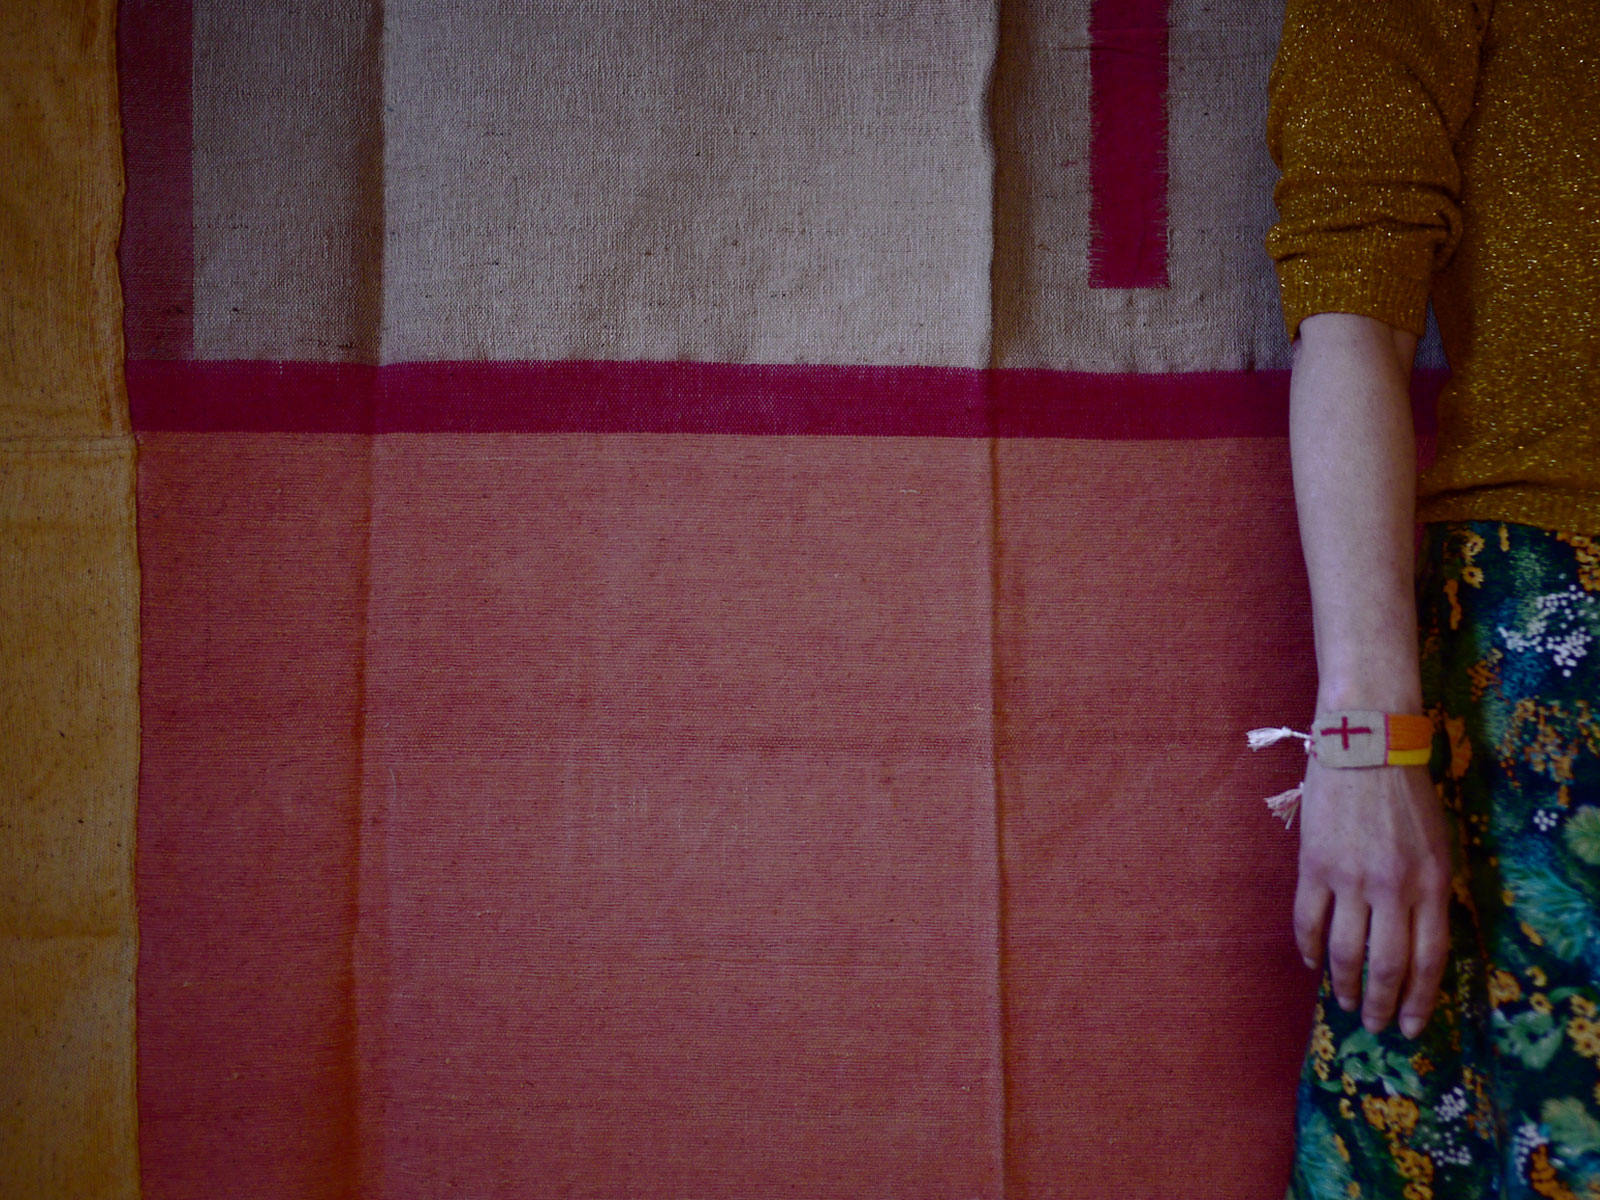 Bracelets LOOM - Design textile by Myriam Balaÿ myriam-balay-piece1 MICRO/MACRO L'appartement